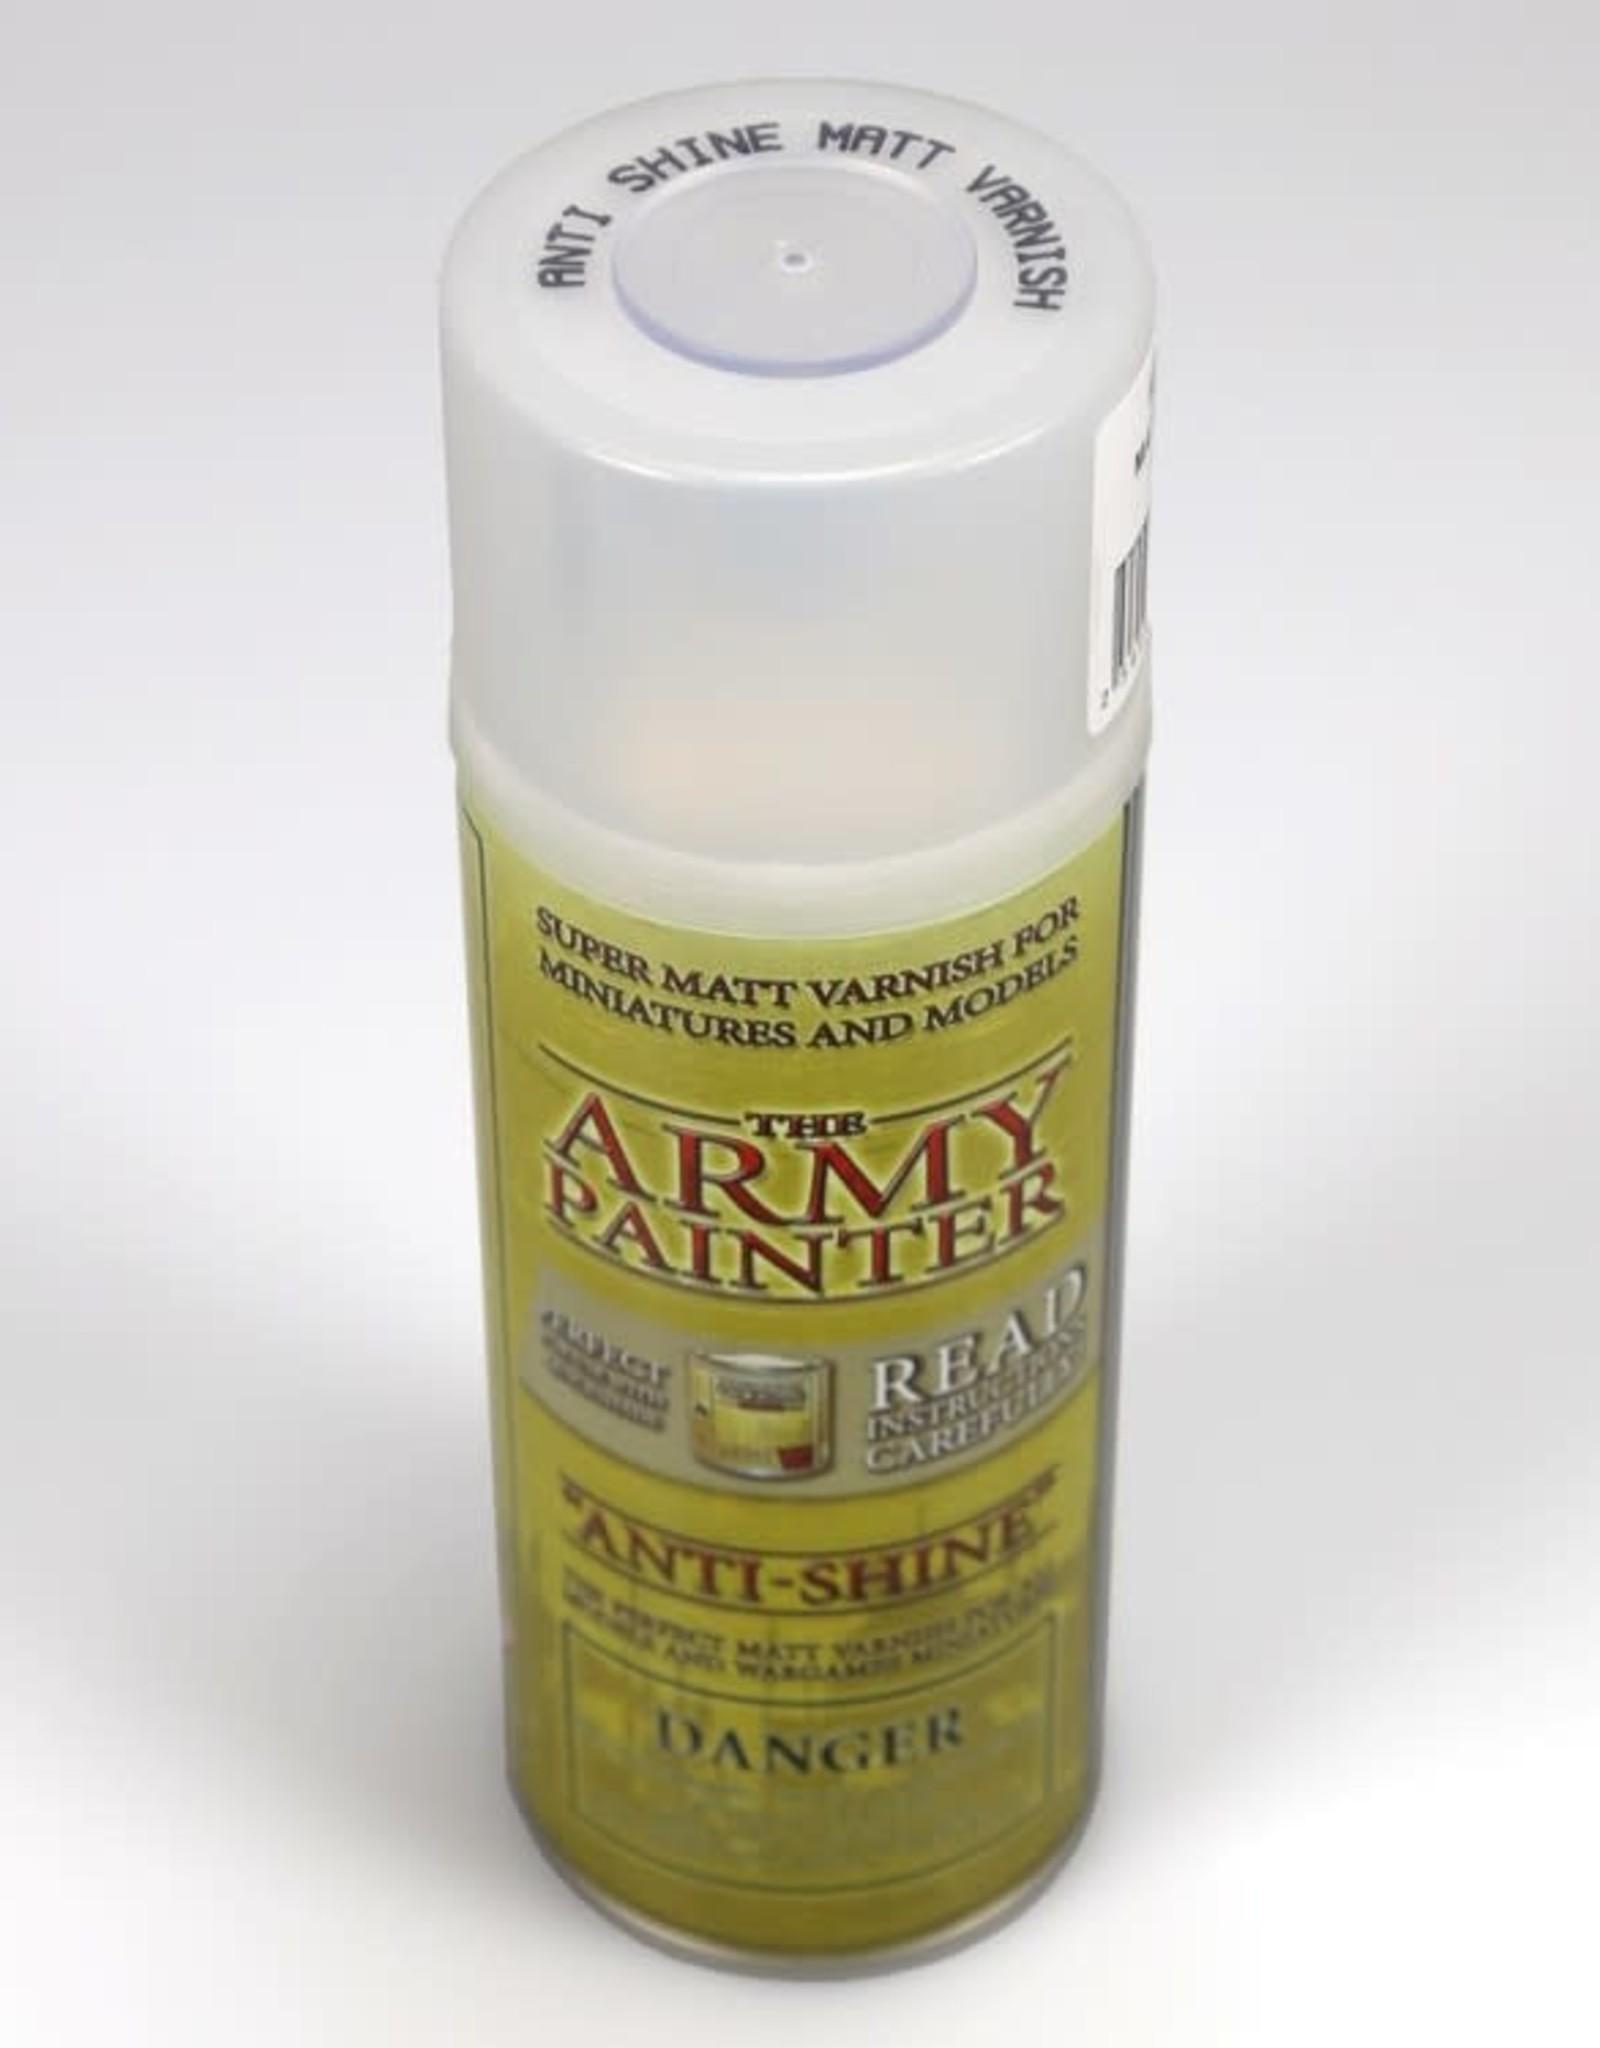 Army Painter Base Primer: Anti-Shine Matte Varnish (spray)